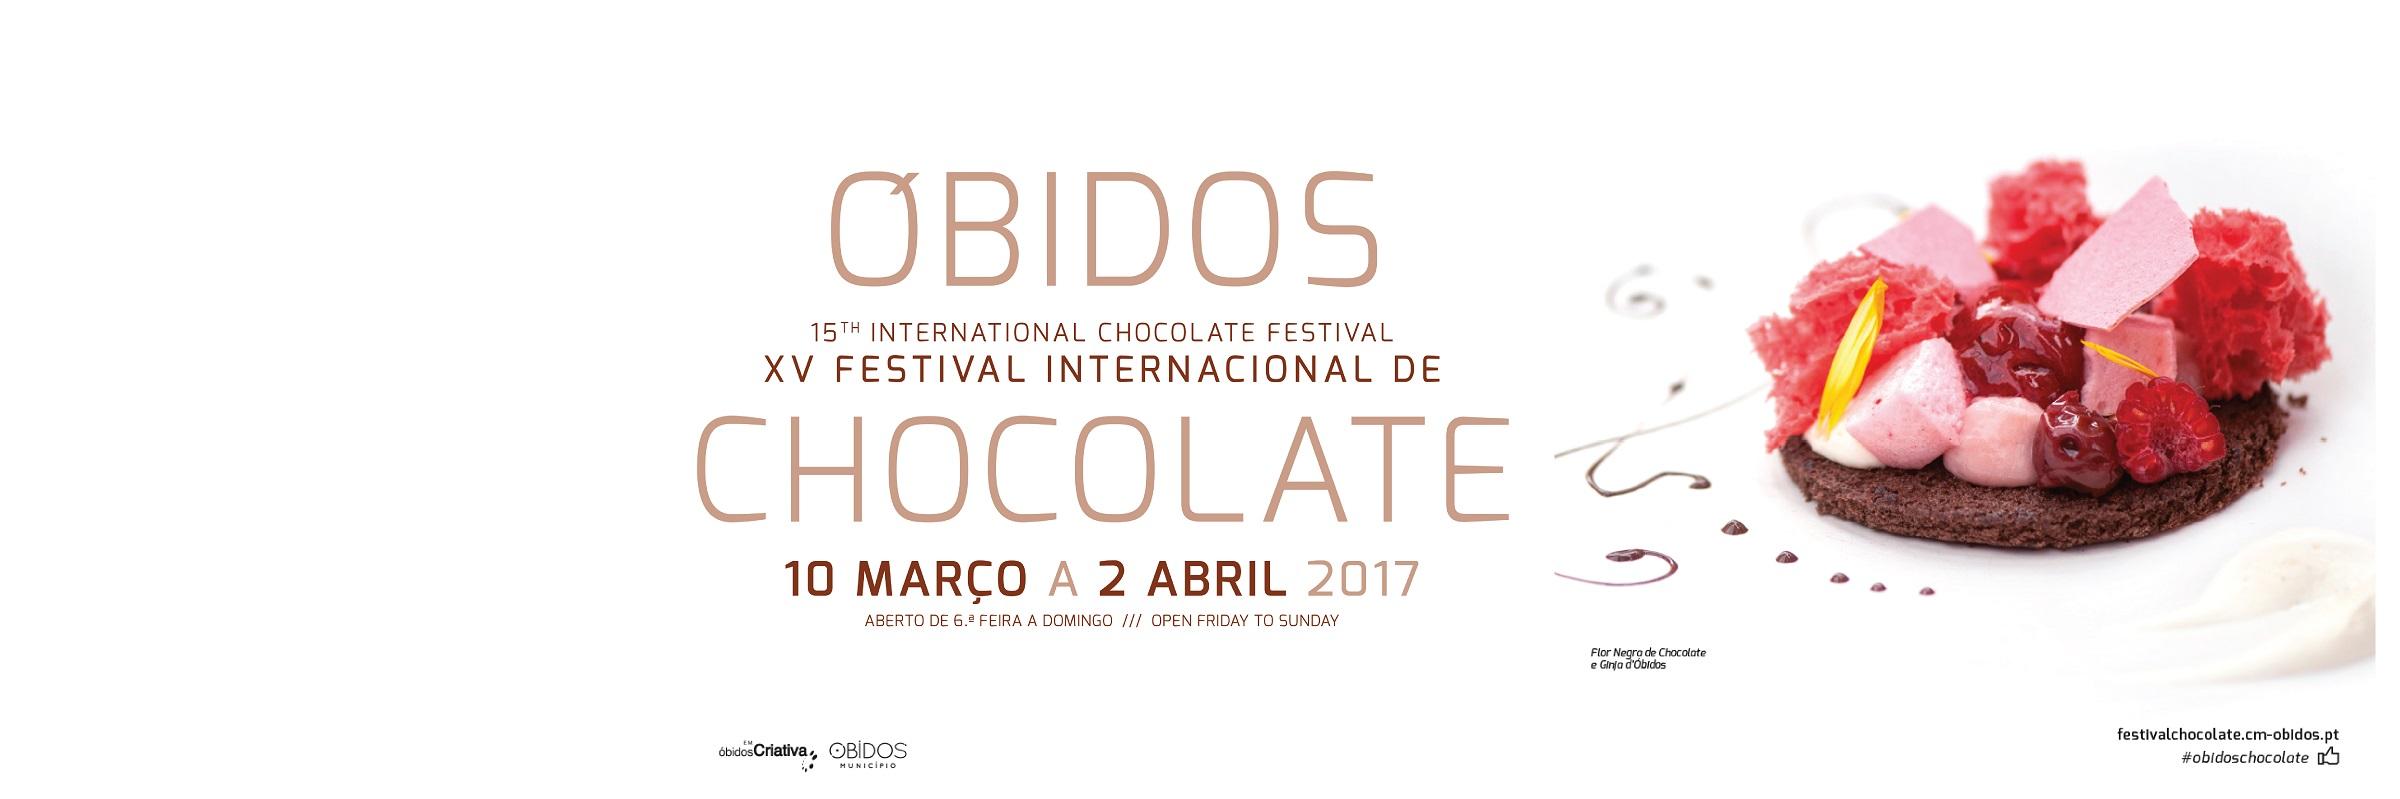 obidos-choco-2017